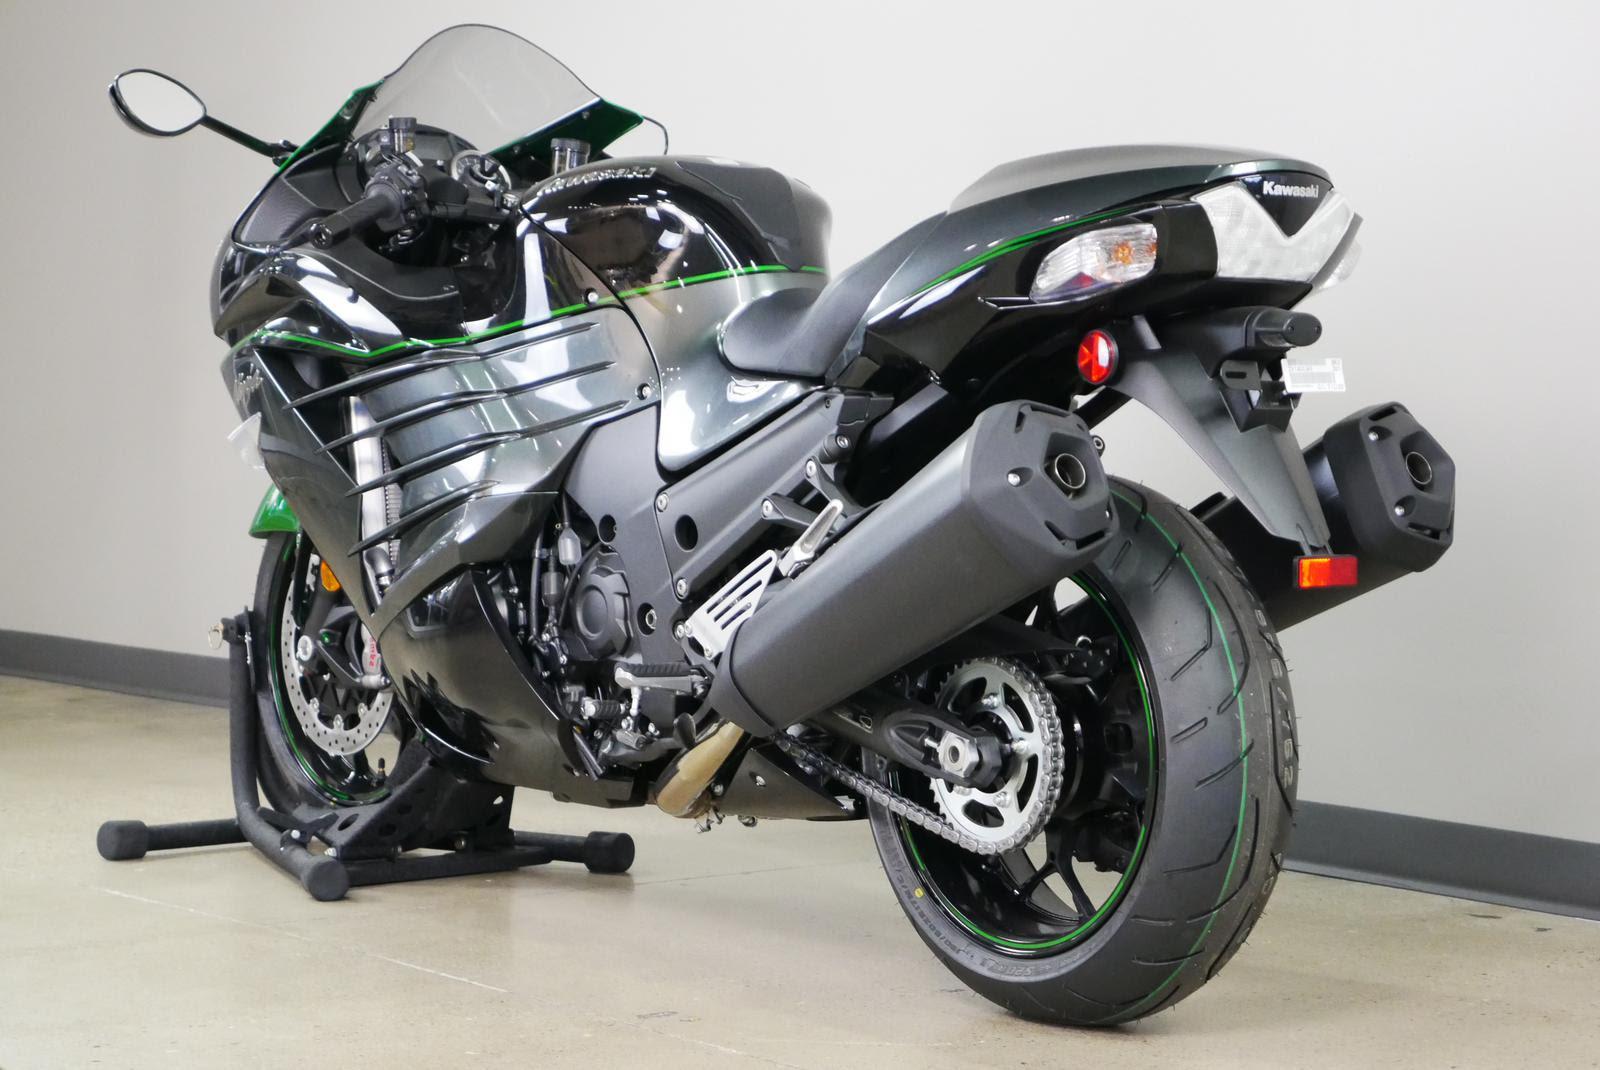 2019 Kawasaki Ninja Zx 14r Abs For Sale In Indianapolis In